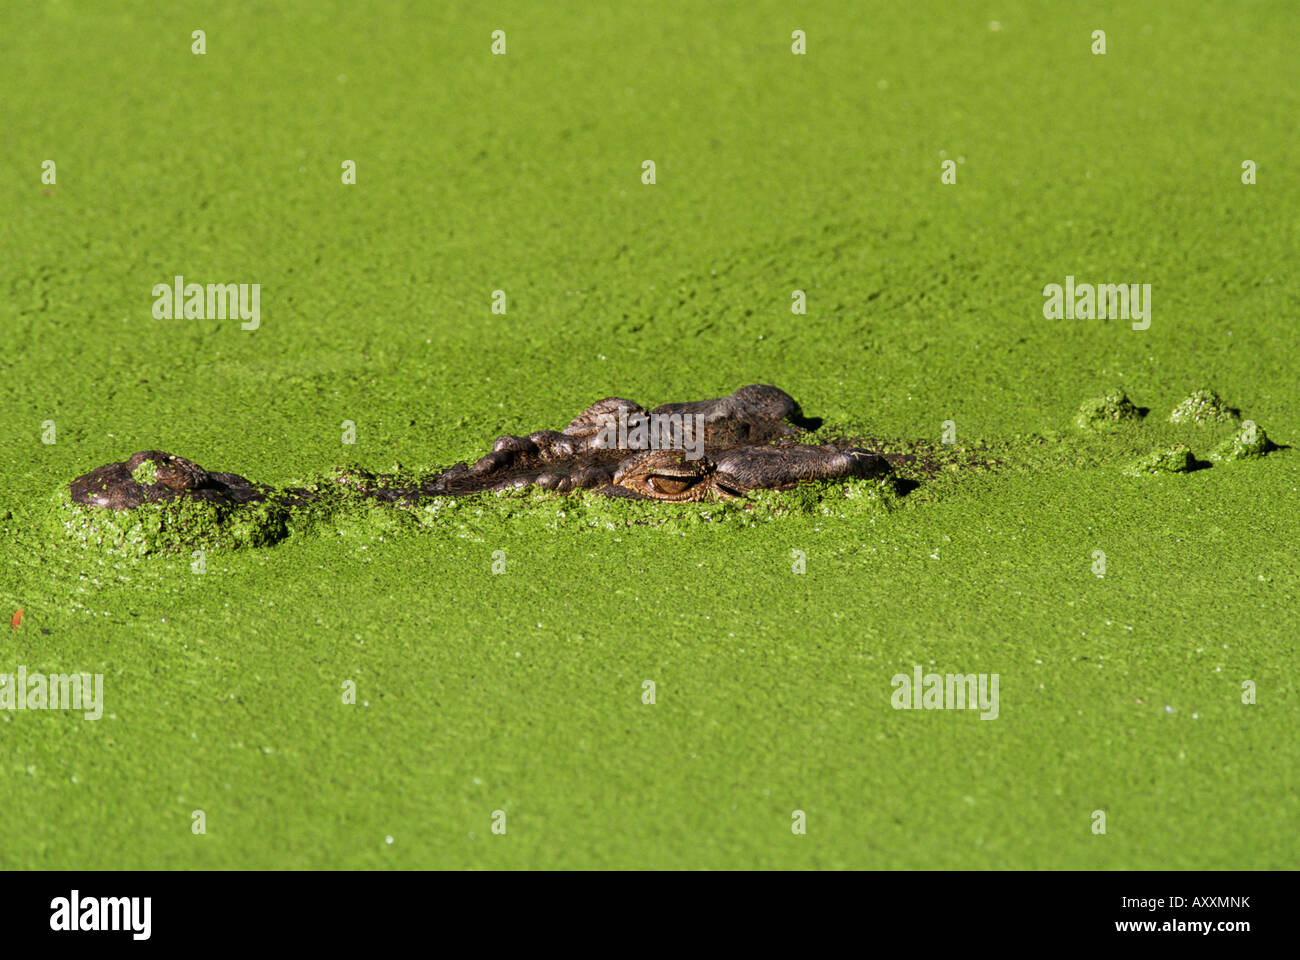 Saltwater crocodile (Crocodylus porosus), Rainforest Habitat sanctuary, Queensland, Australia, Pacific - Stock Image